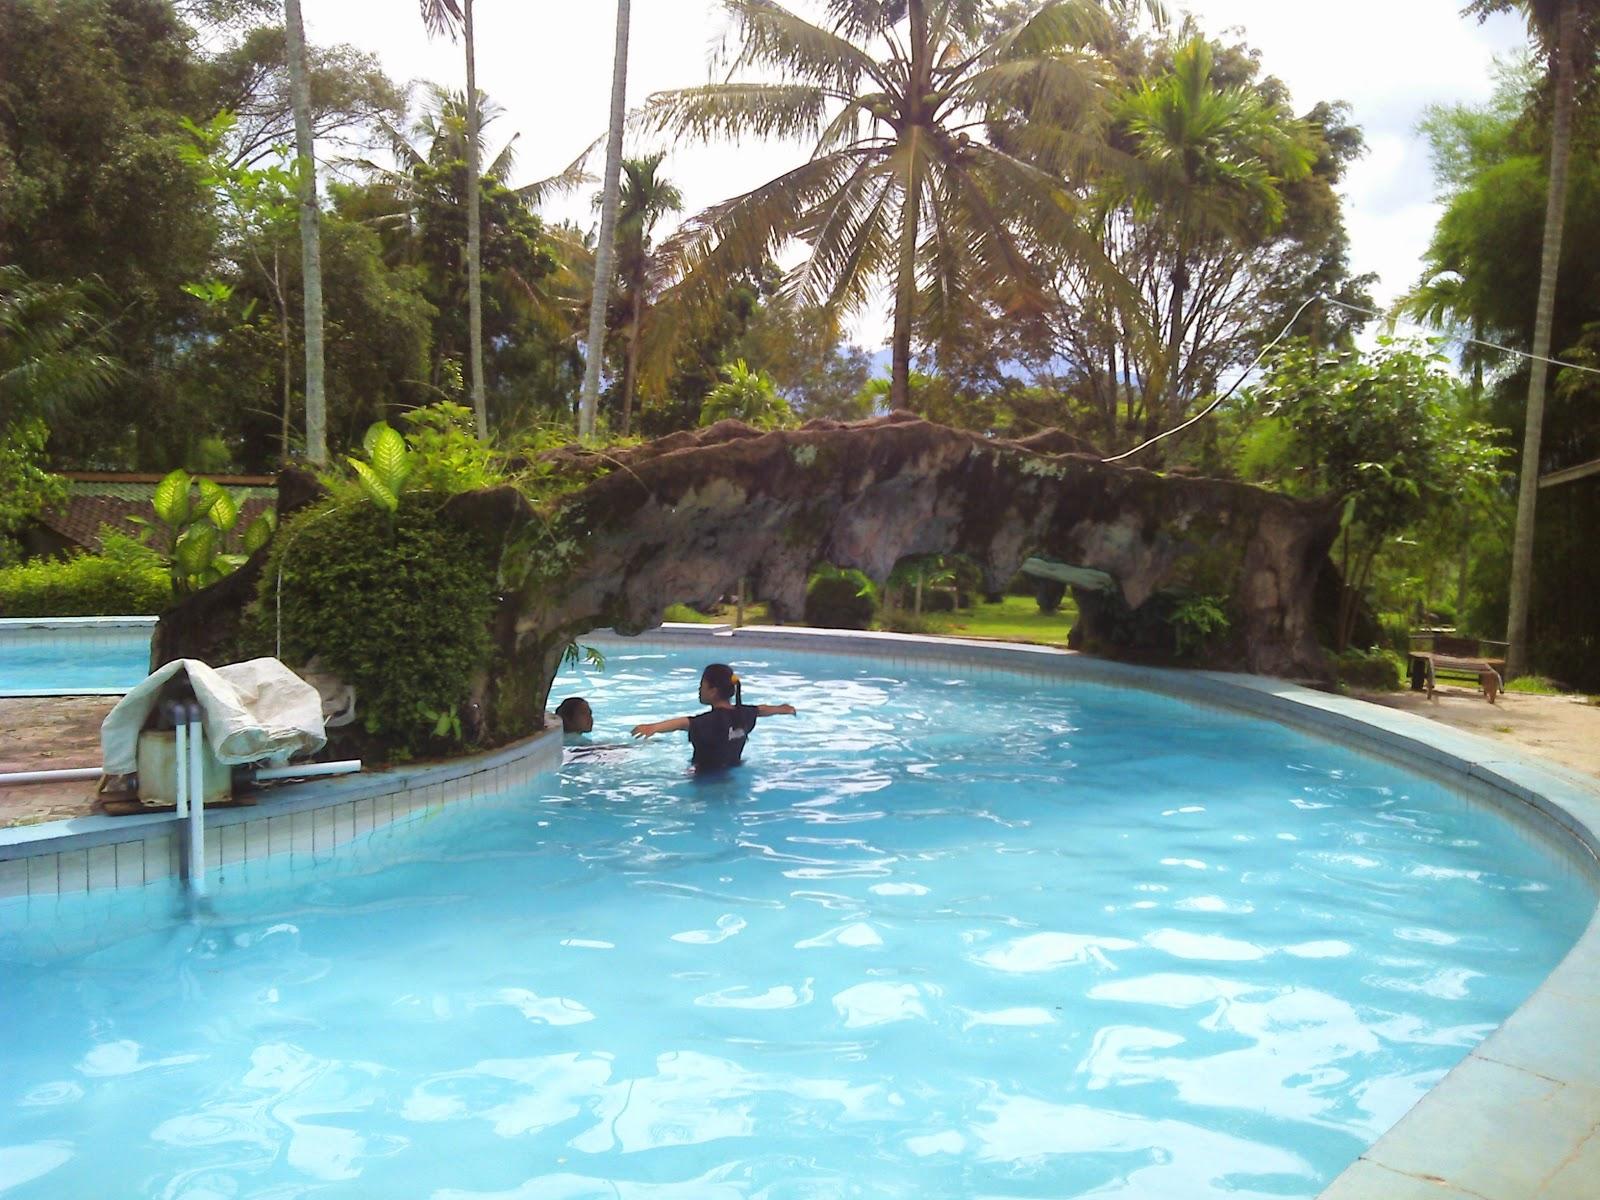 Semarang Dibawah Galeri Foto Berkunjung Taman Rekreasi Rawa Permai Tuntang